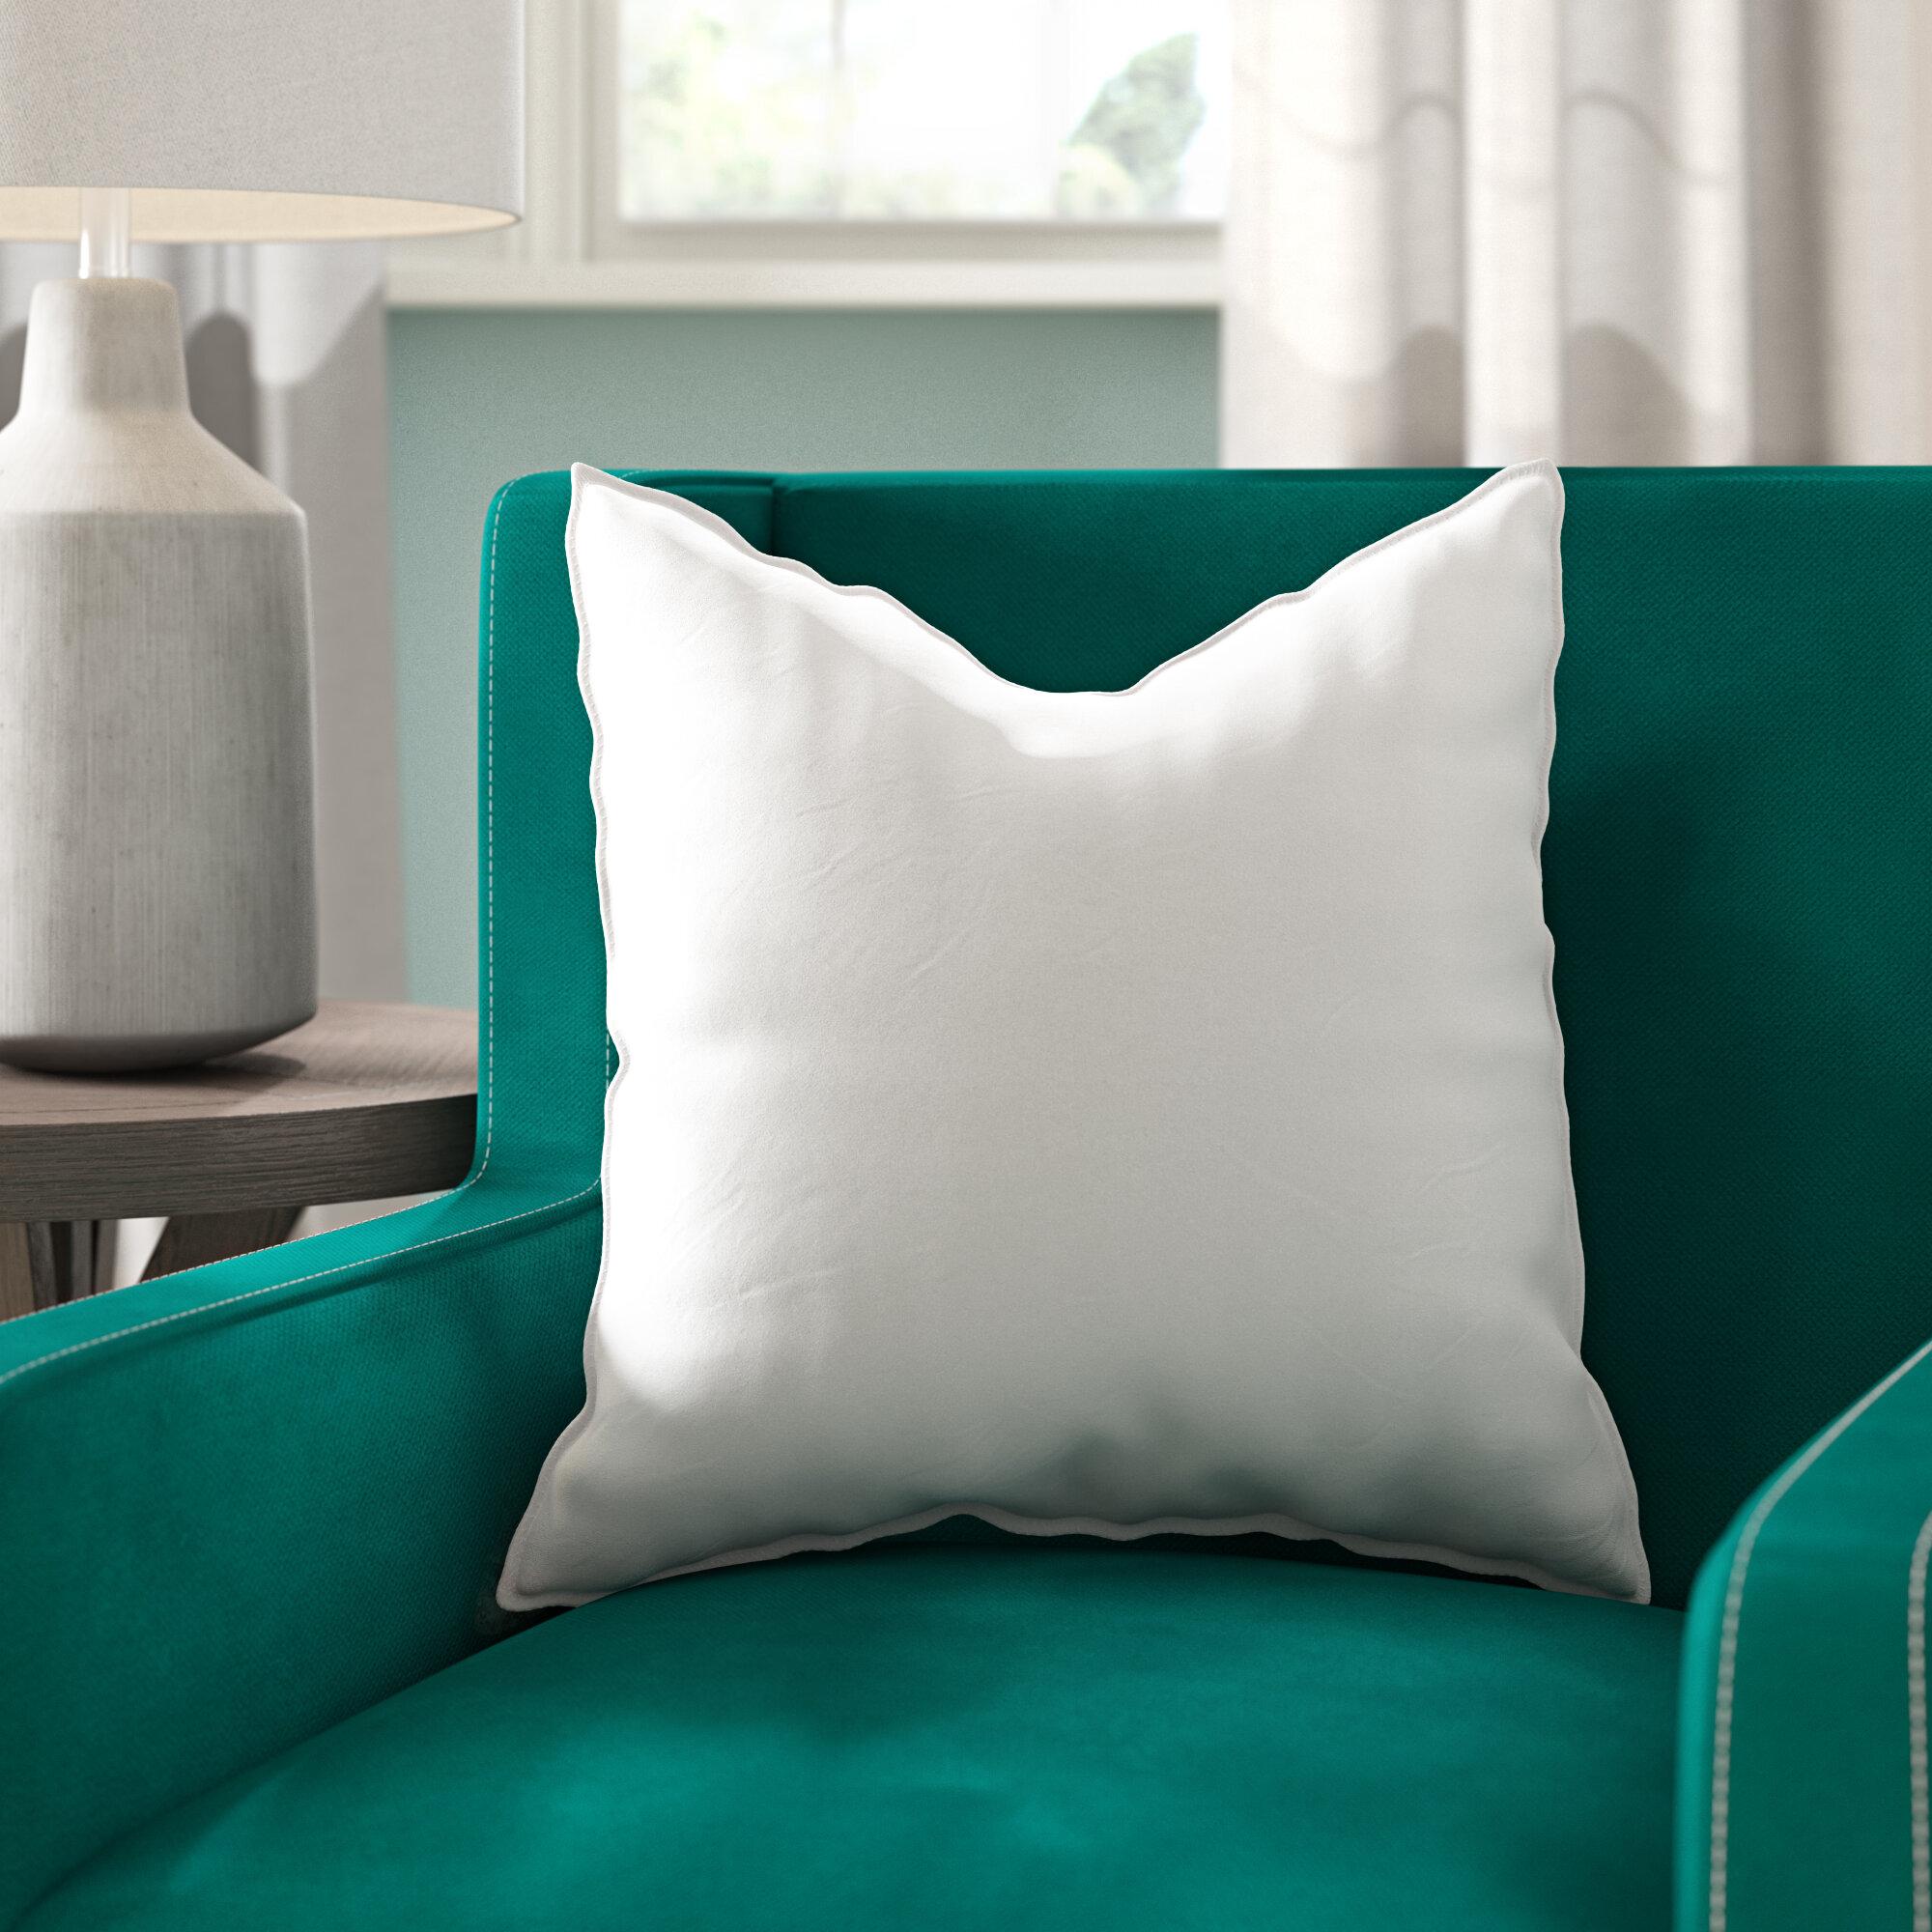 18 Square Throw Pillows Free Shipping Over 35 Wayfair